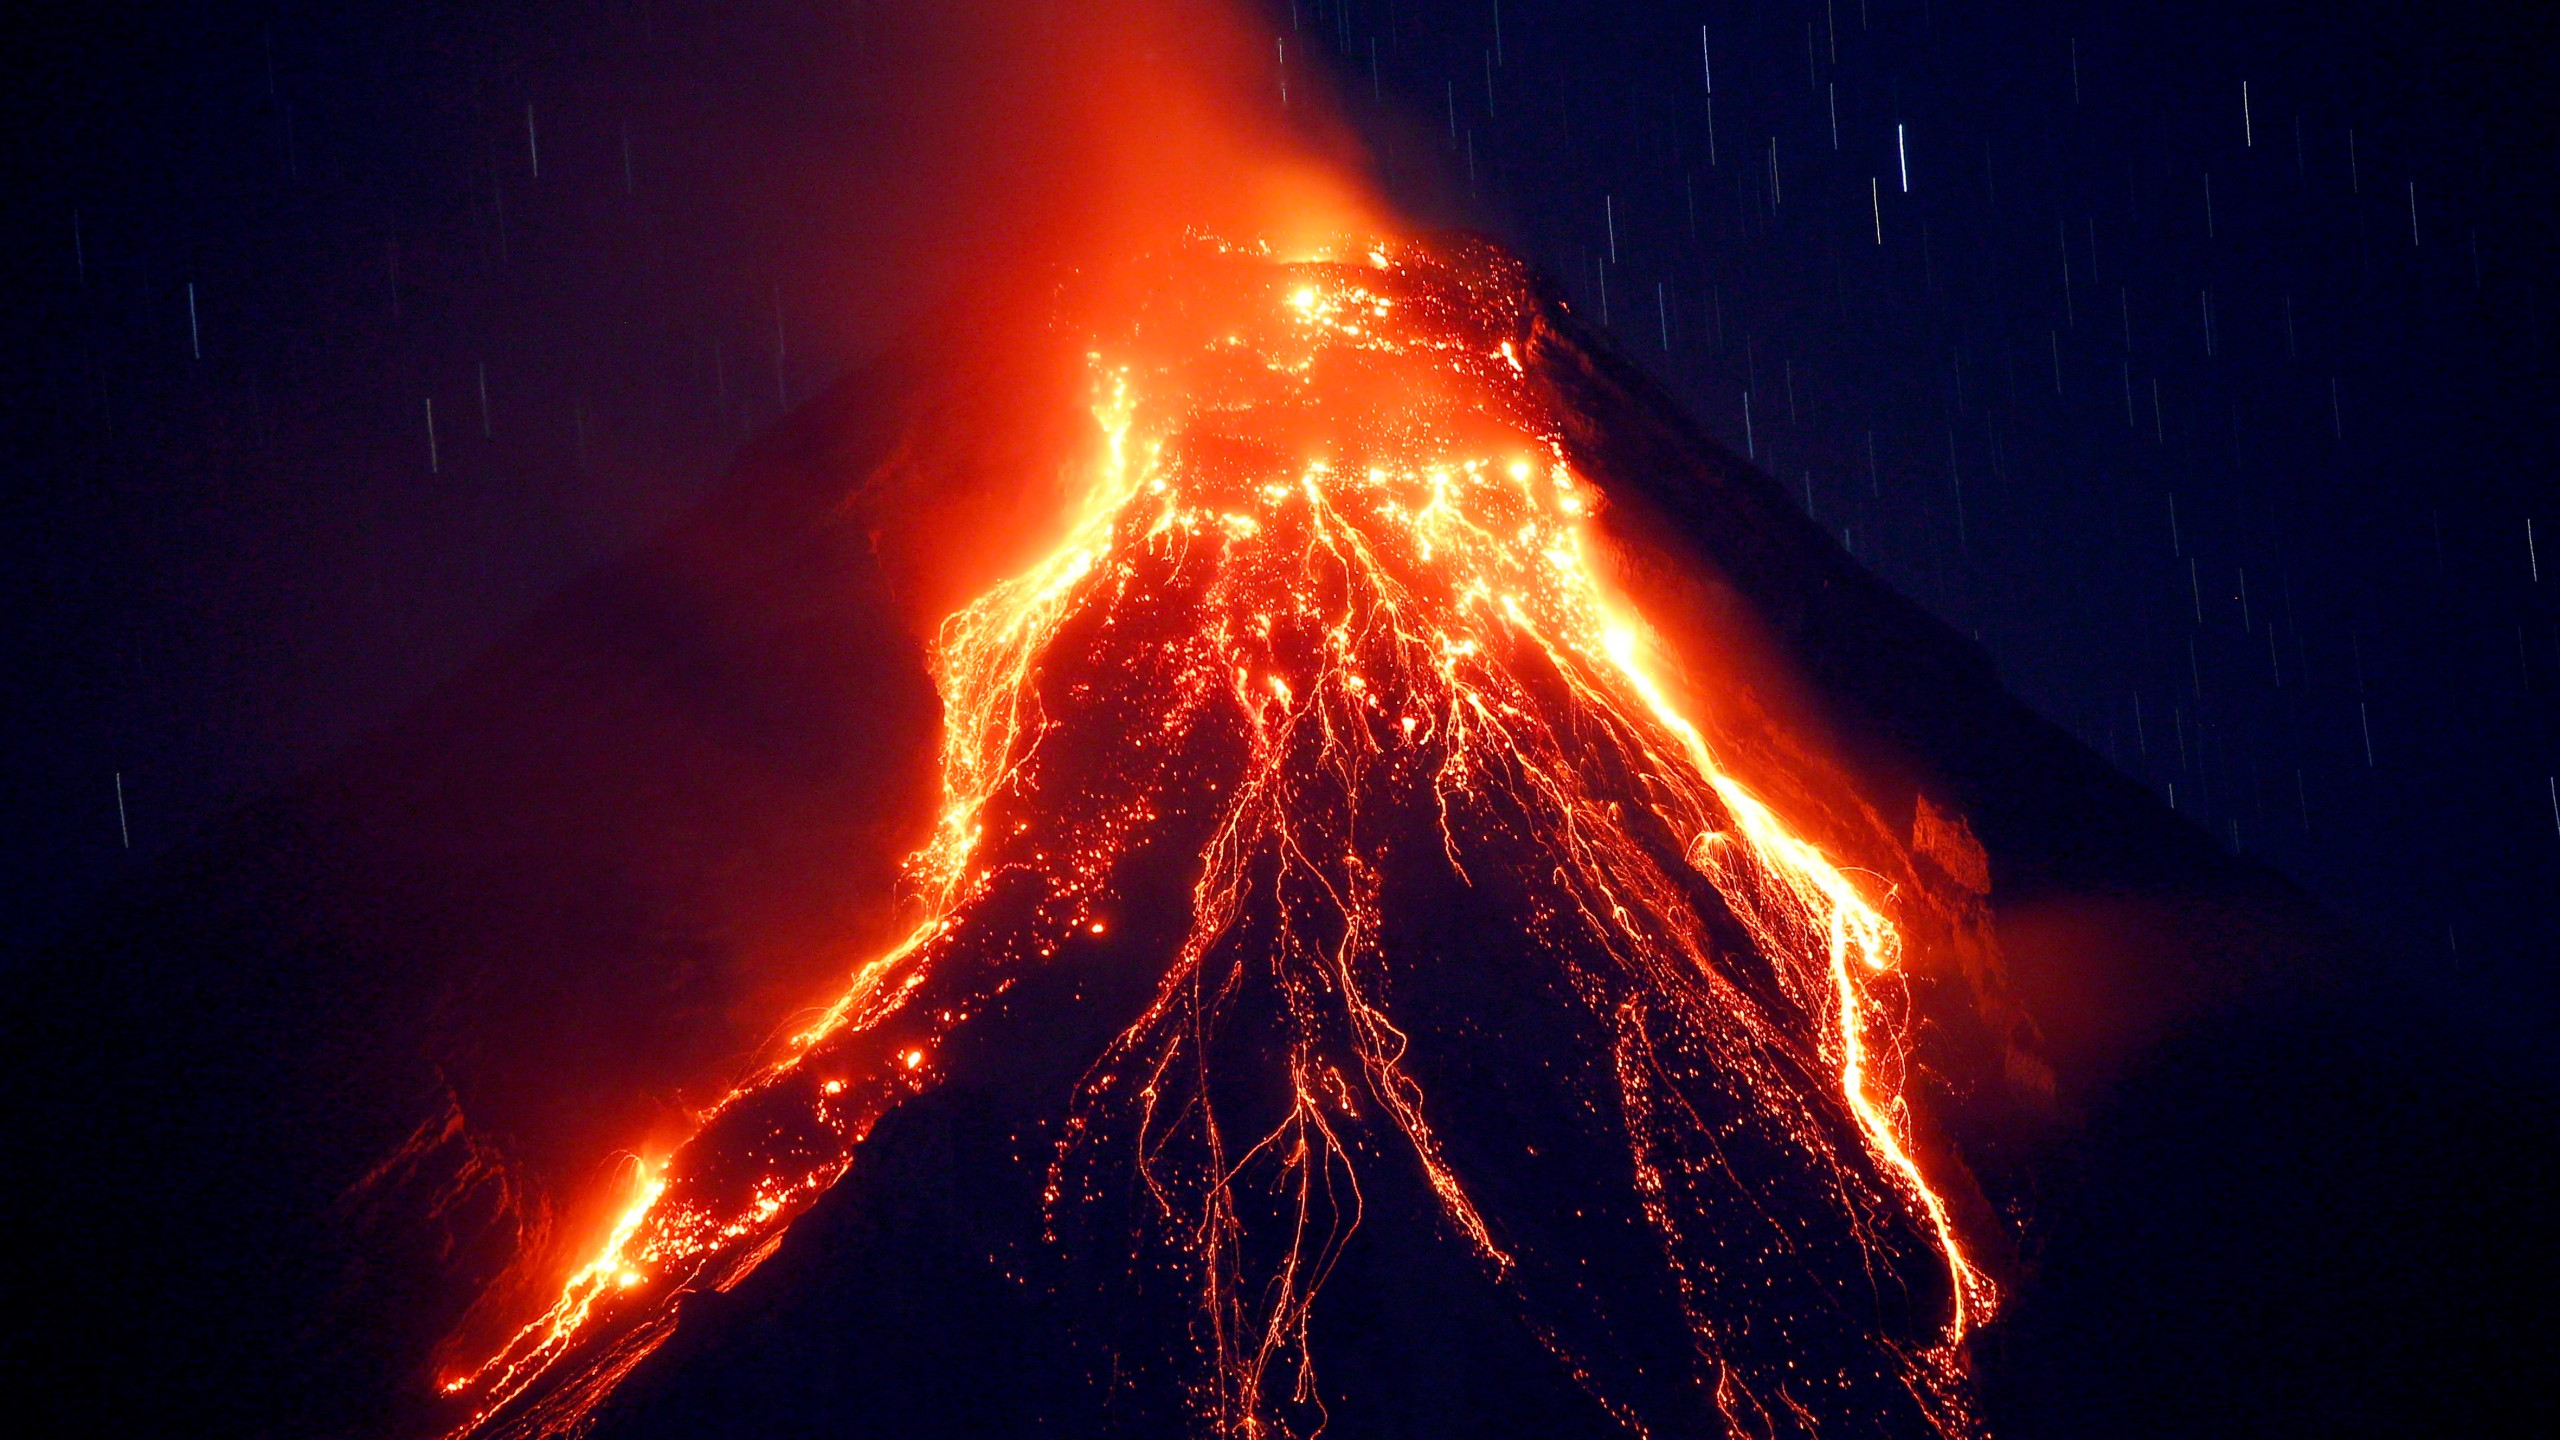 Philippines_Volcano_51752-159532.jpg96092331